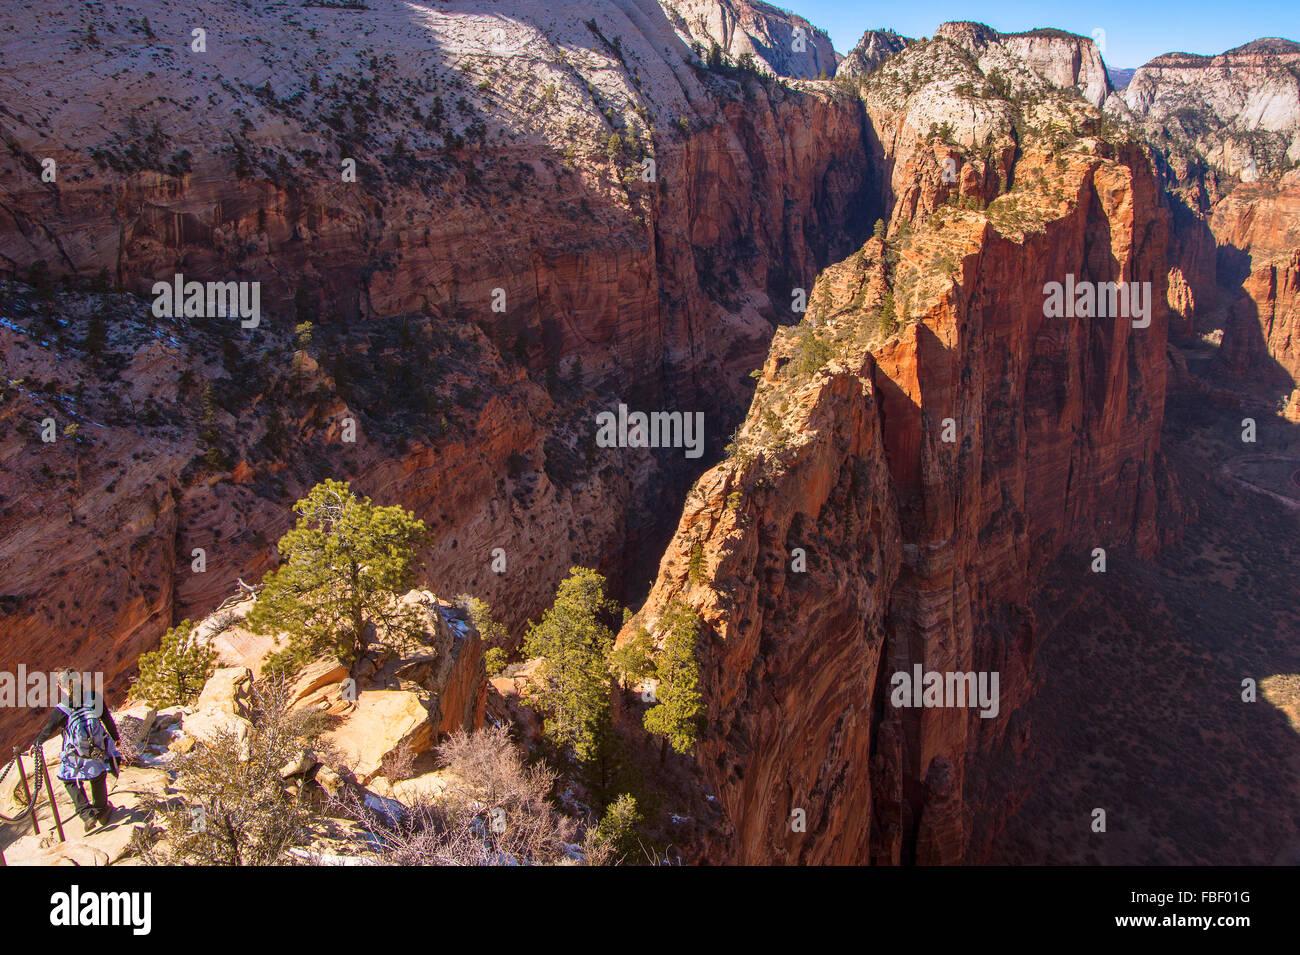 Hike to Angels Landing, Zion National Park, Utah - Stock Image